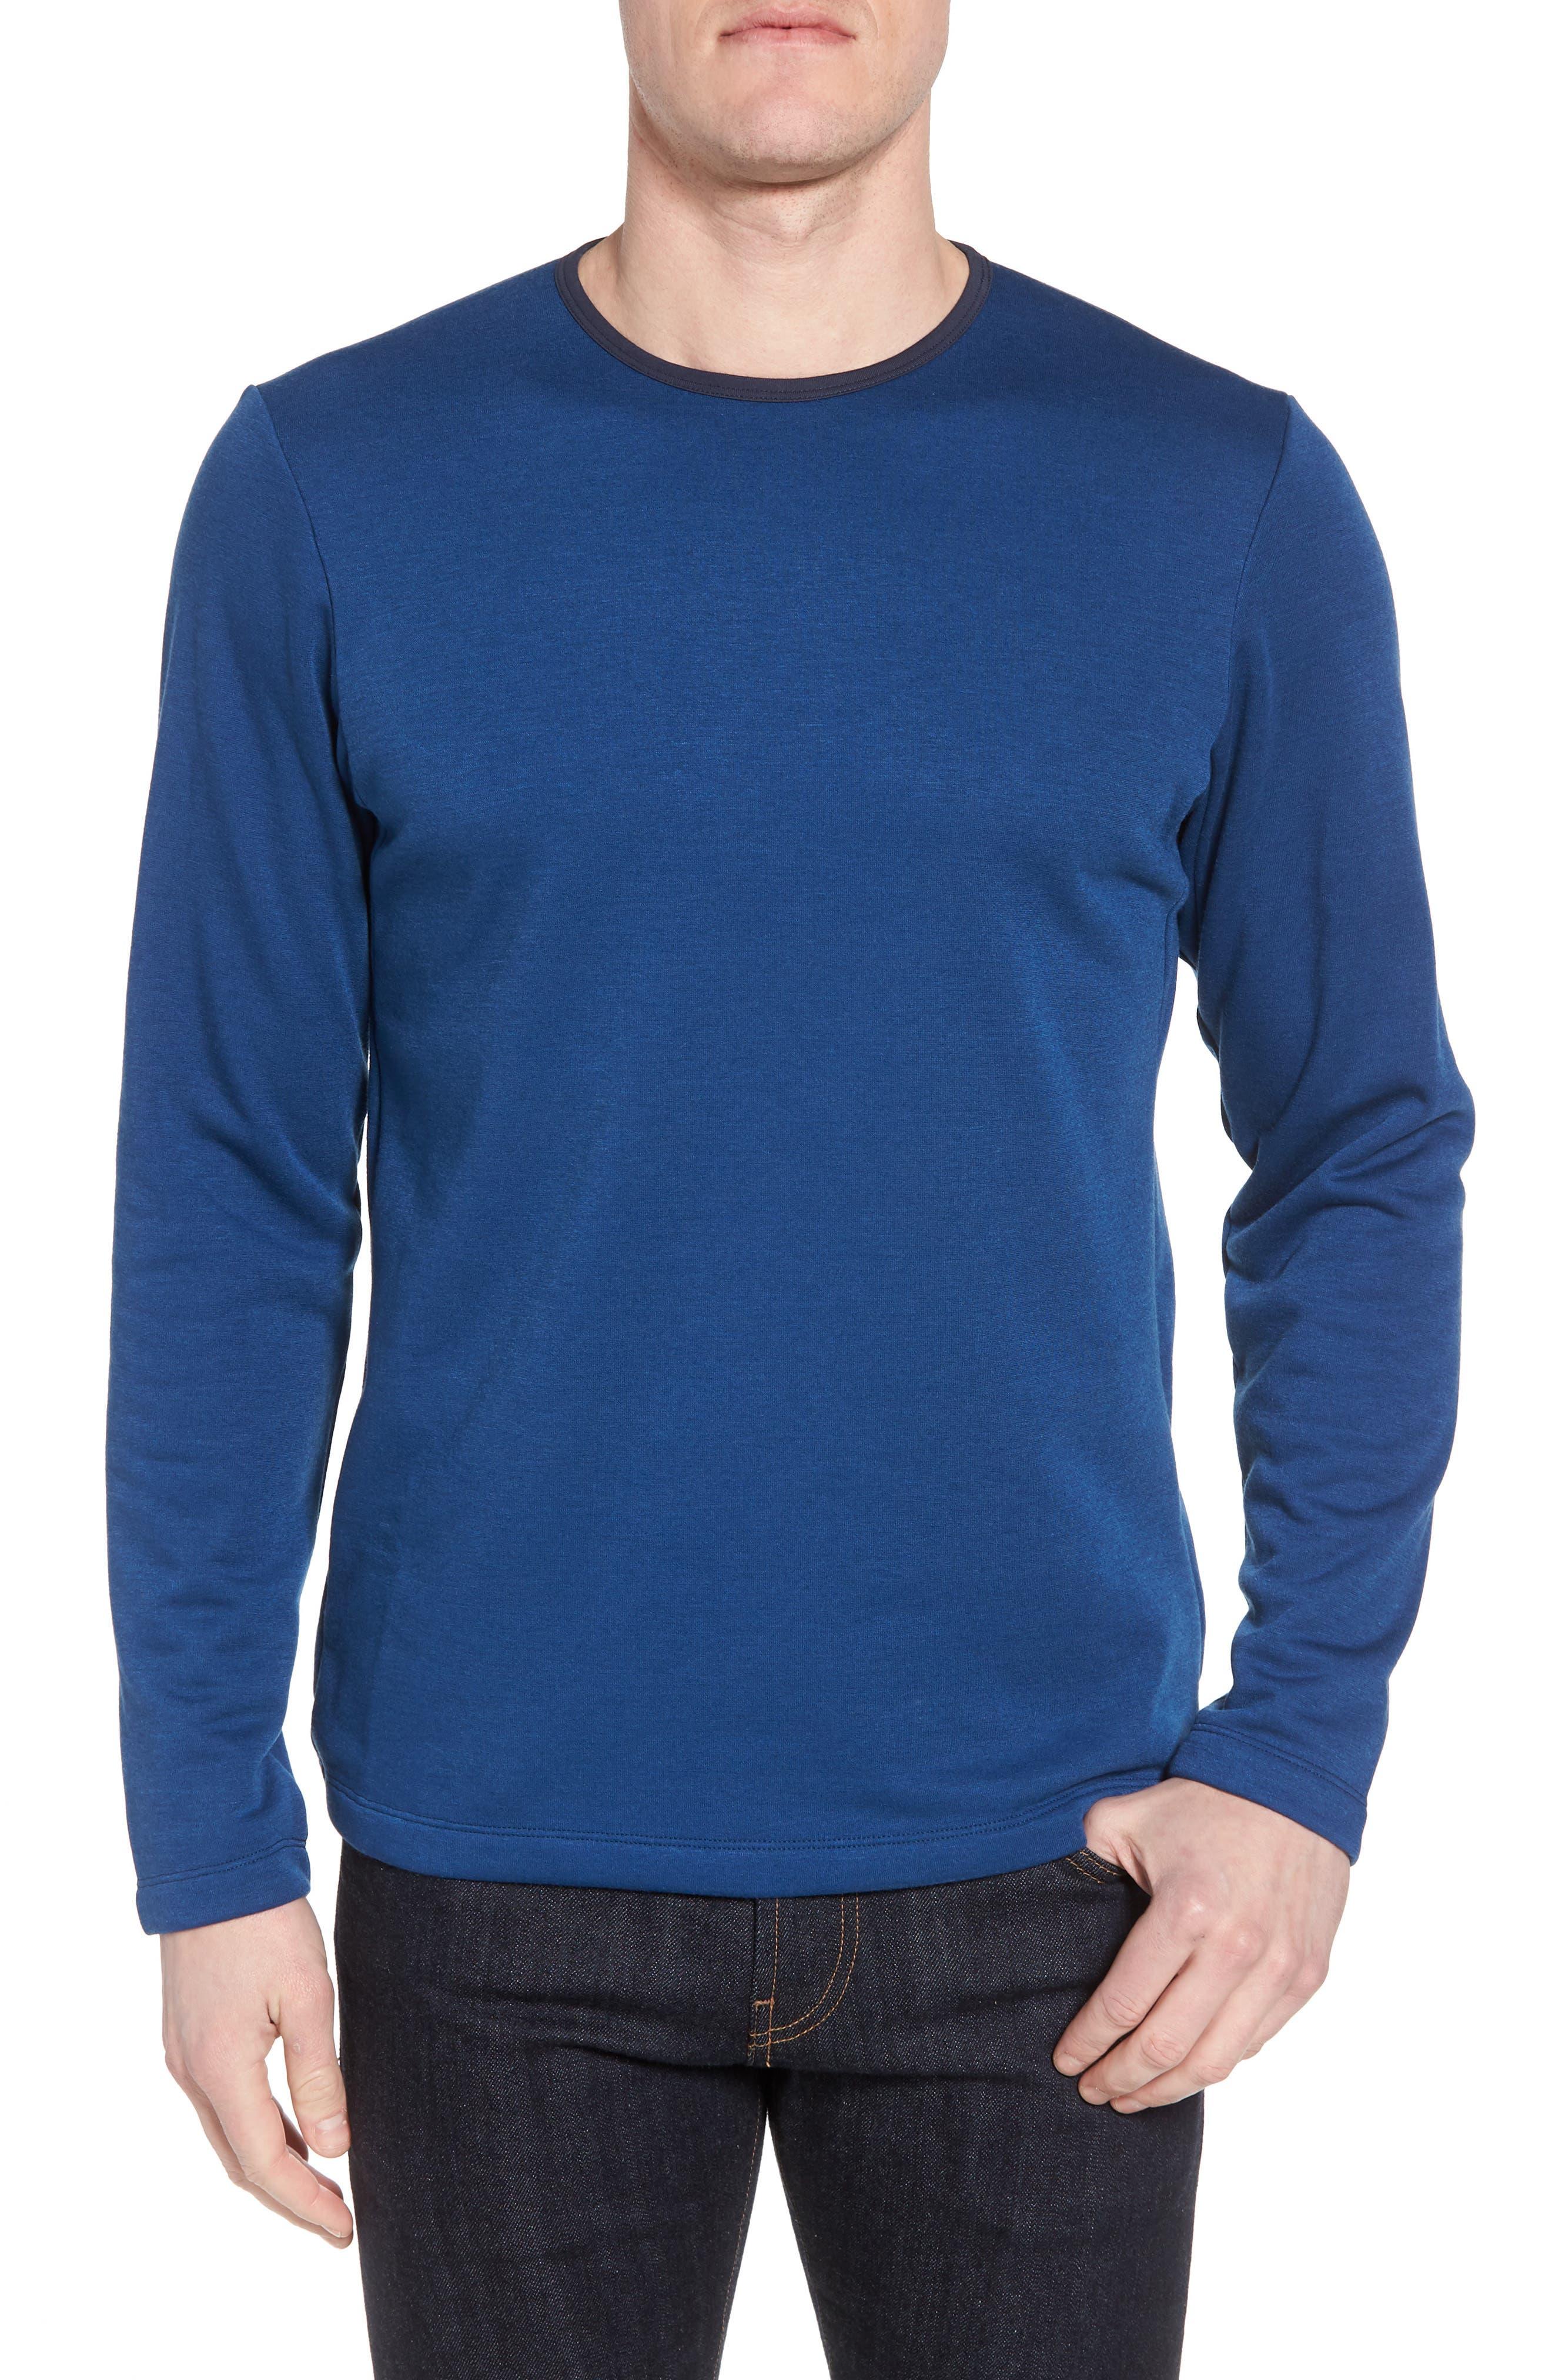 Dallen Sweatshirt,                             Main thumbnail 2, color,